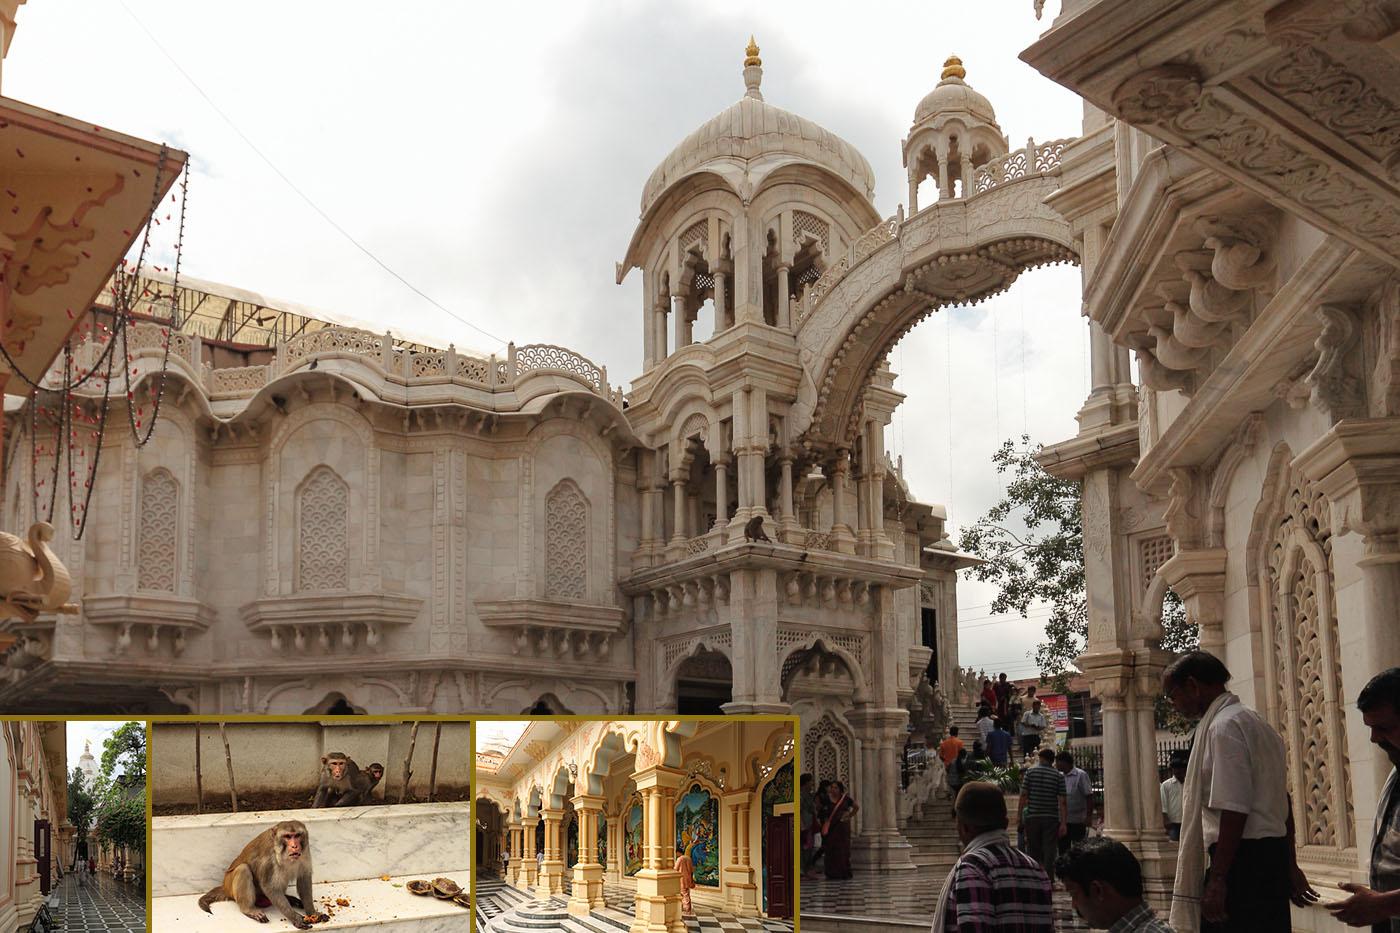 Фотография 15. Путешествия по Индии. Храм Шри Кришна-Баларама в городе Агра